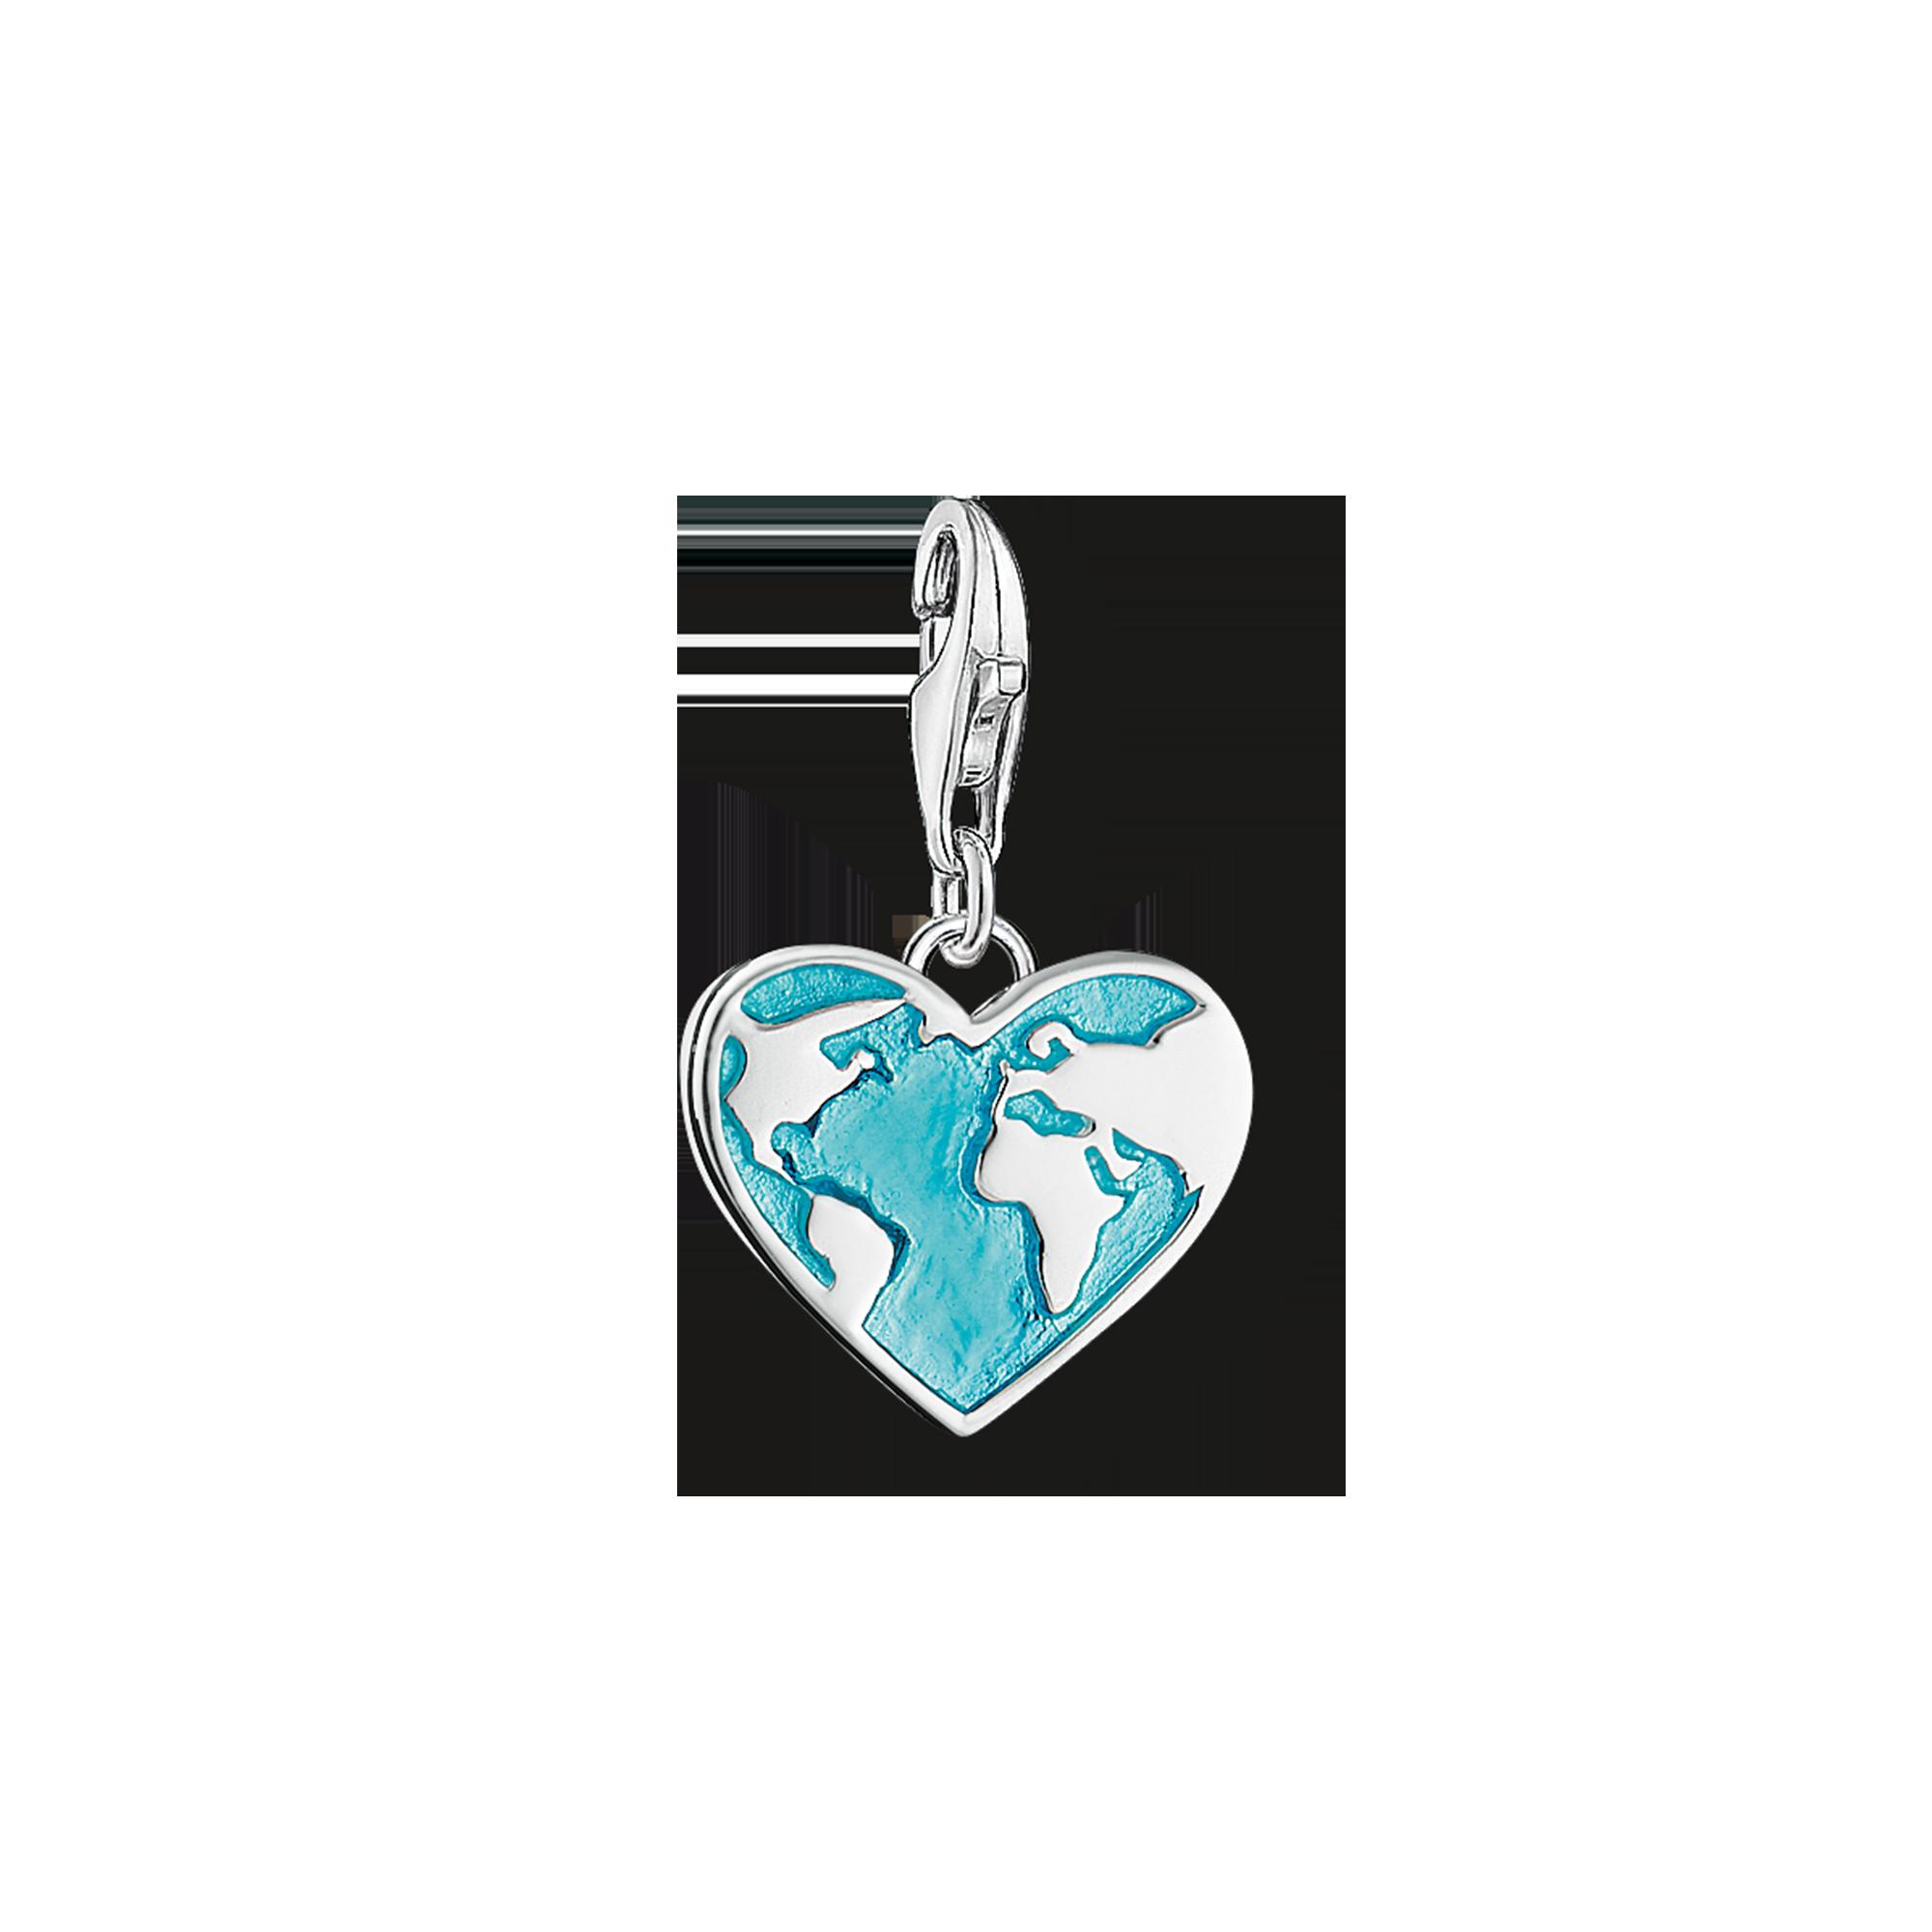 "Thomas Sabo - Charm pendant ""heart globe"" - 1"